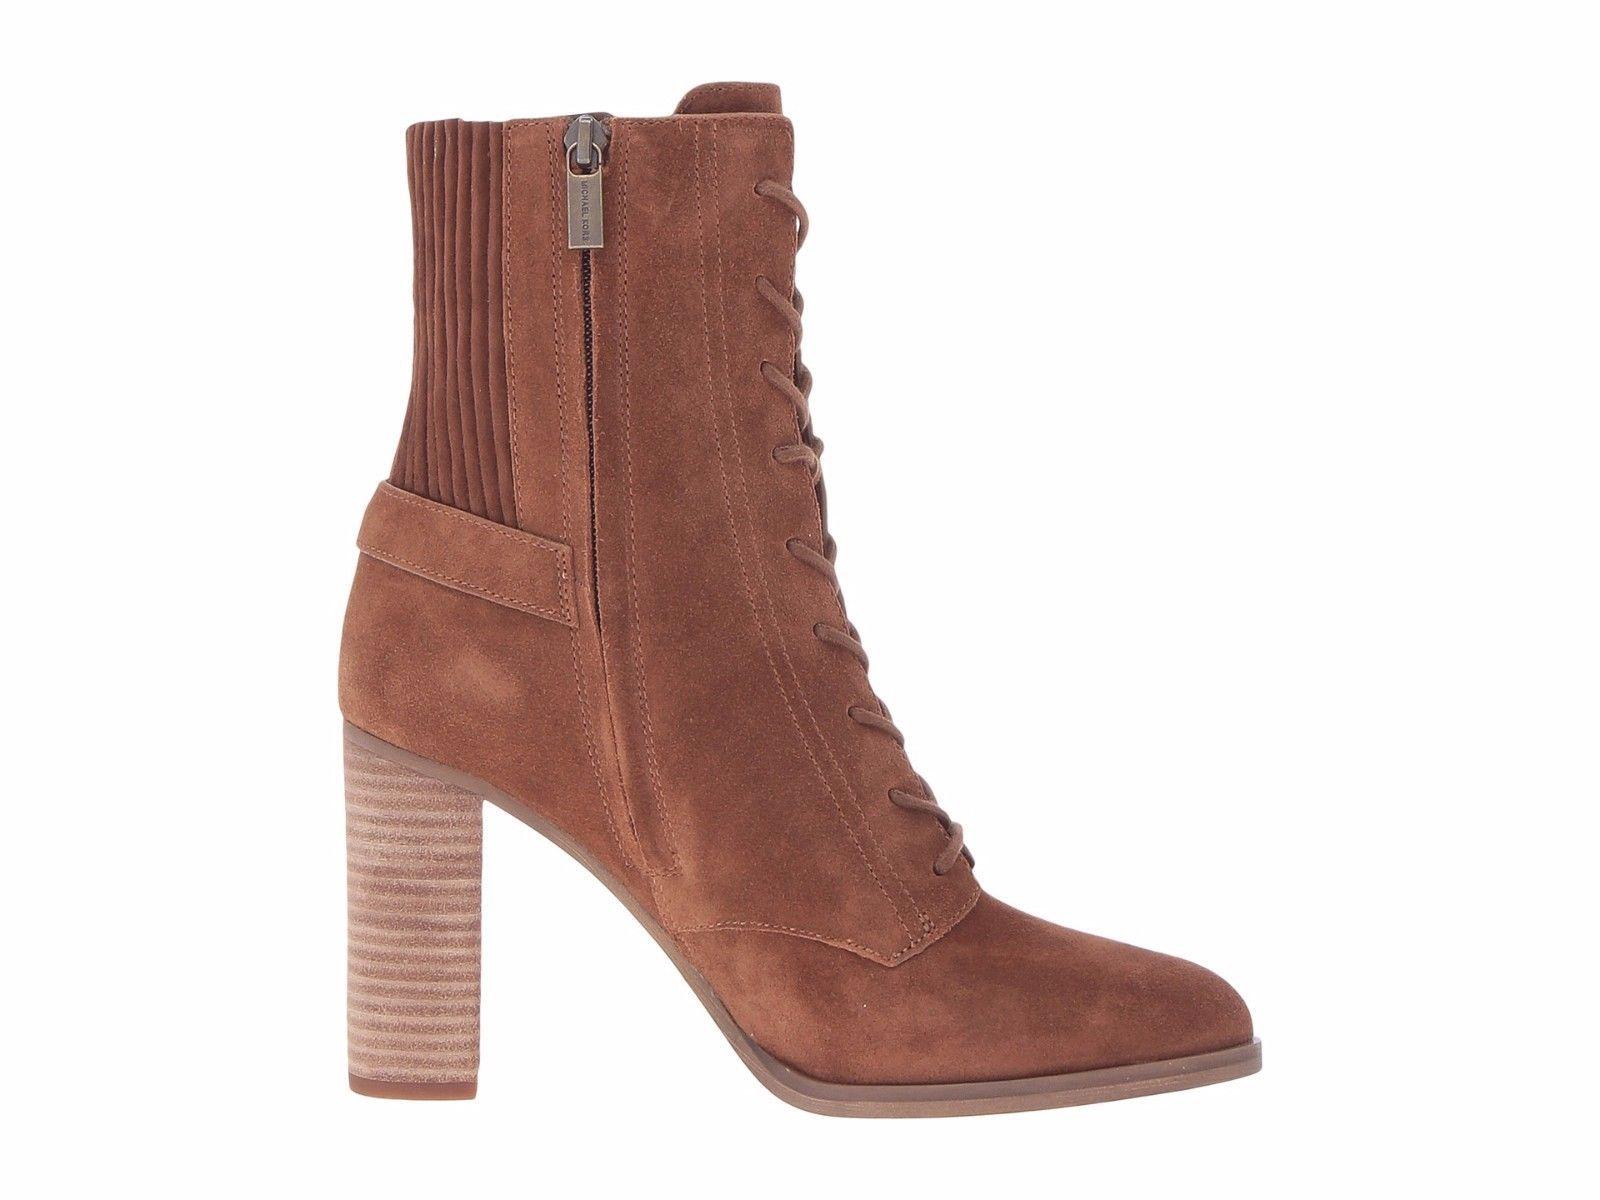 4eace05c70ed MICHAEL Michael Kors Women s Carrigan Bootie Boots Dk Caramel  260.00 Mult  Siz